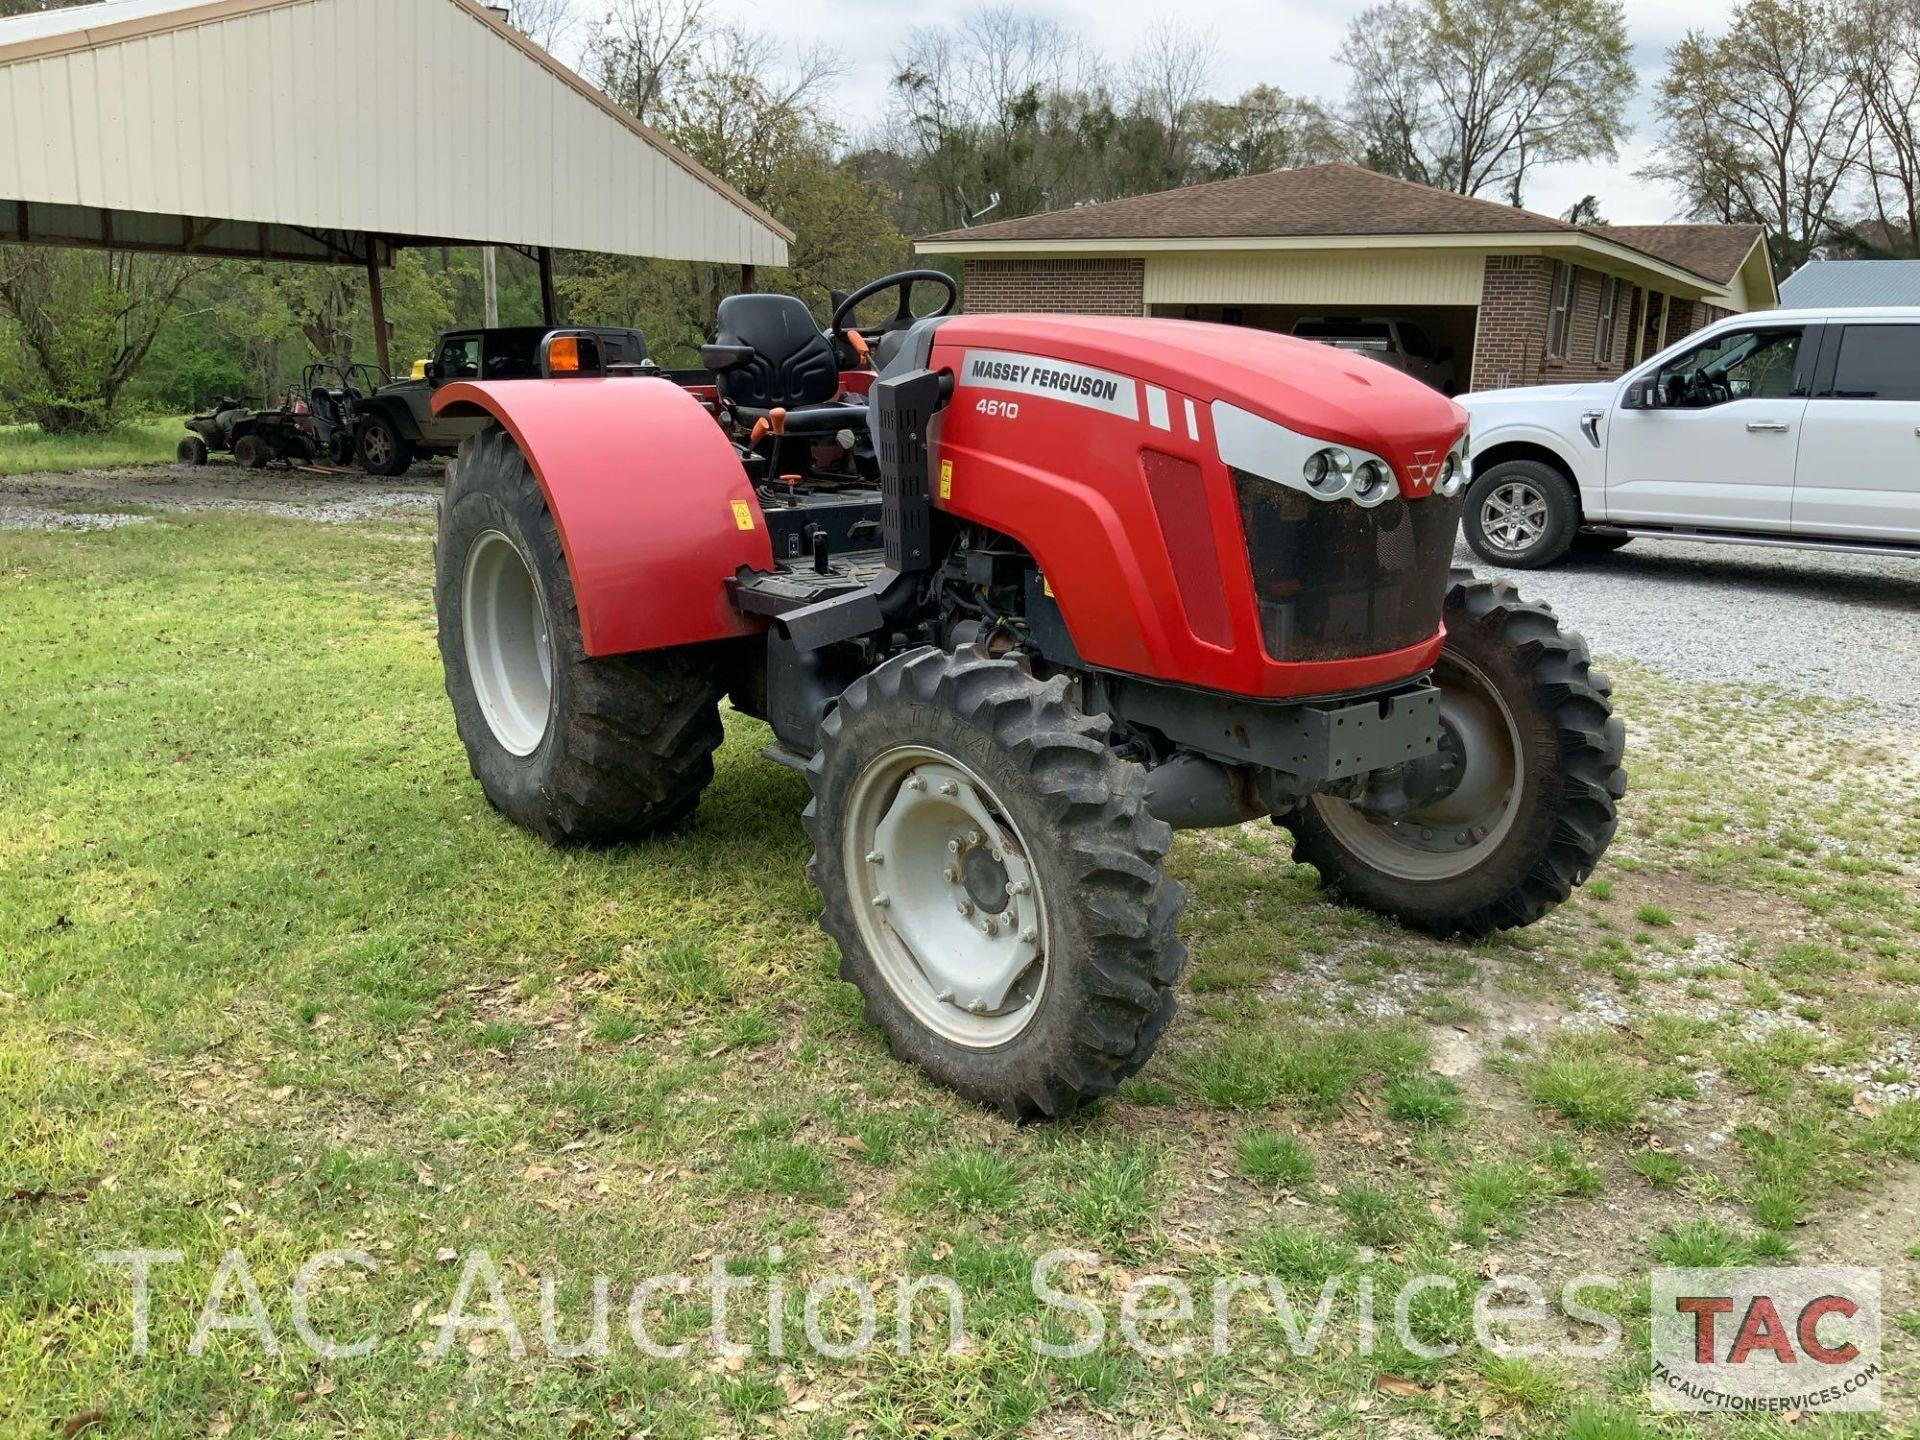 Massey-Ferguson 4610LP Farm Tractor - Image 11 of 26